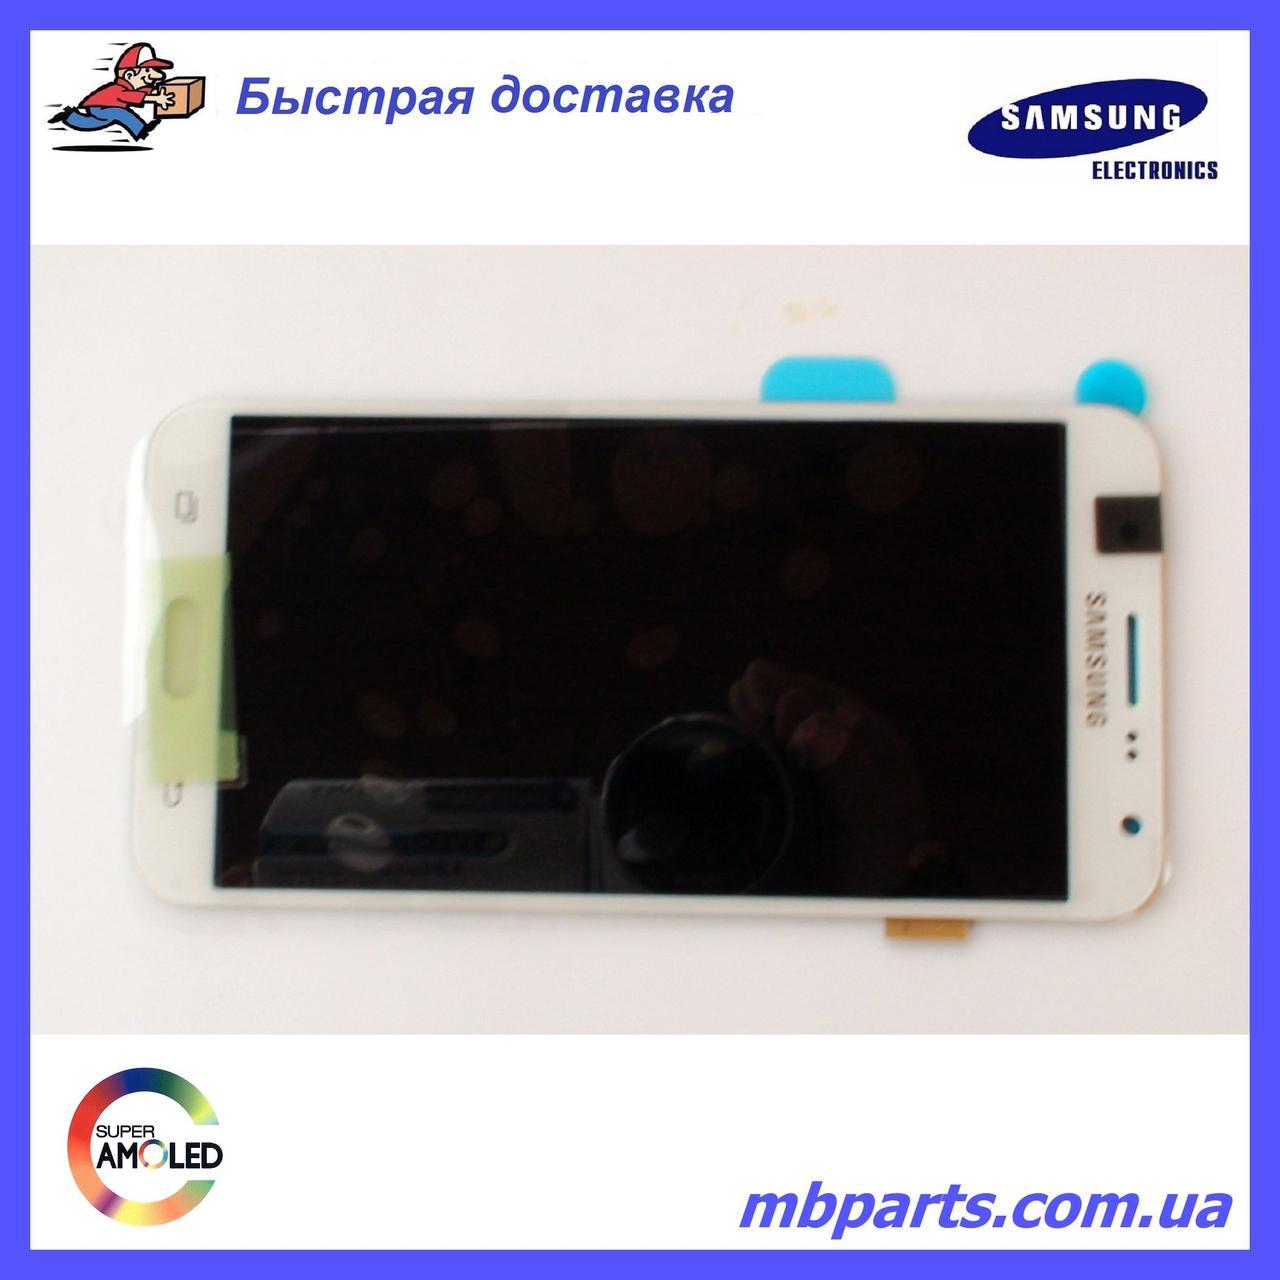 Дисплей с сенсором Samsung J700 Galaxy J7 White оригинал, GH97-17670A